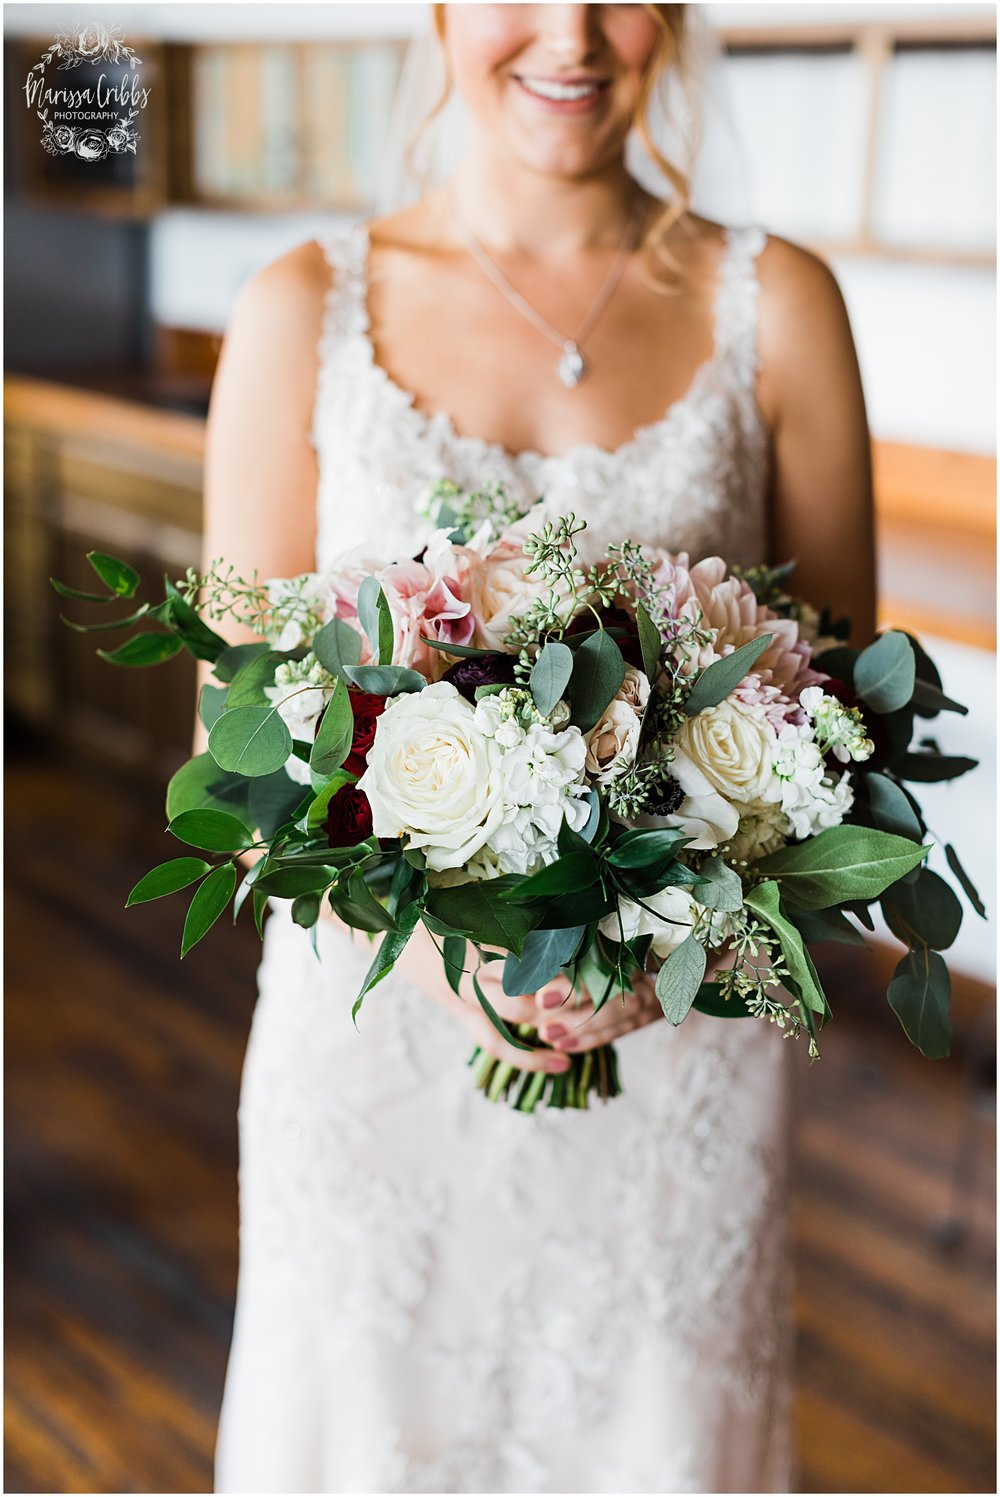 BAUER WEDDING   KELSEA & JUSTIN   MARISSA CRIBBS PHOTOGRAPHY_6511.jpg